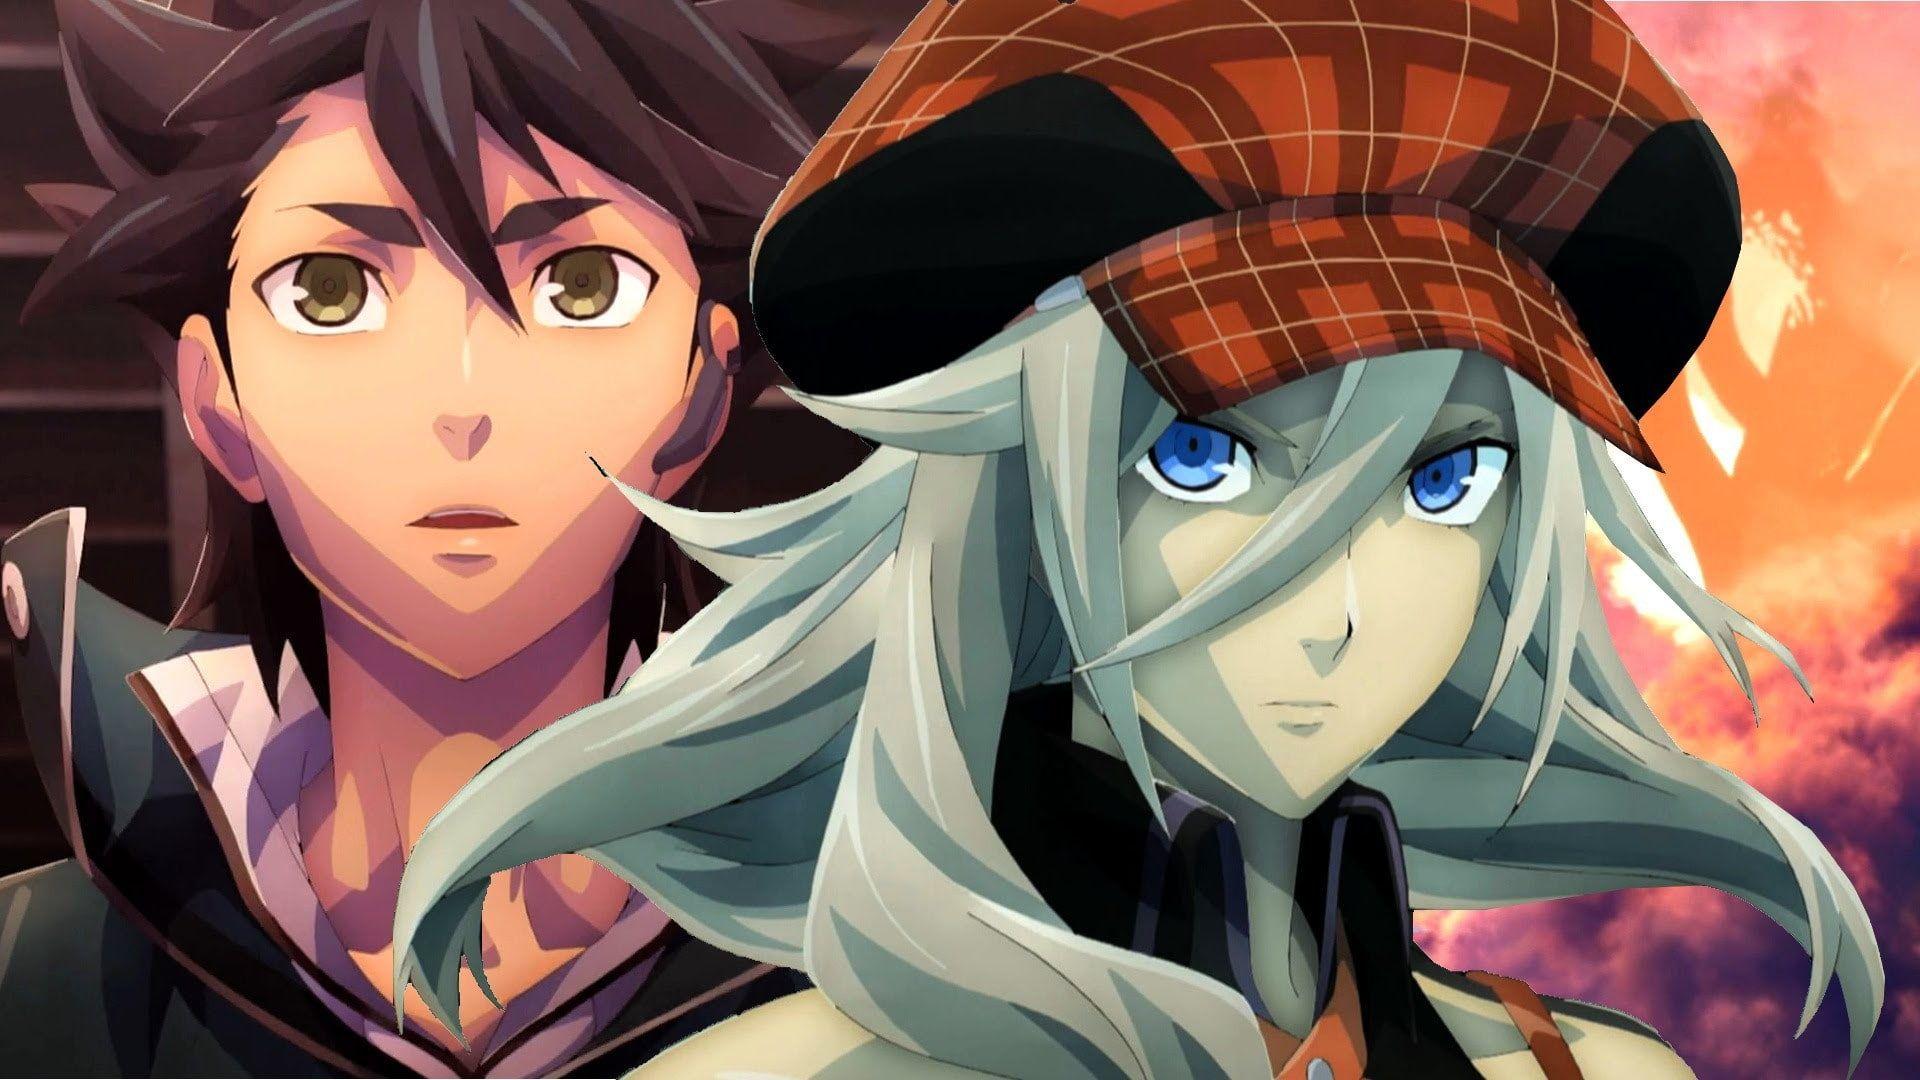 HD wallpaper: Anime, God Eater, Alisa Illinichina Amiella, Utsugi Lenka